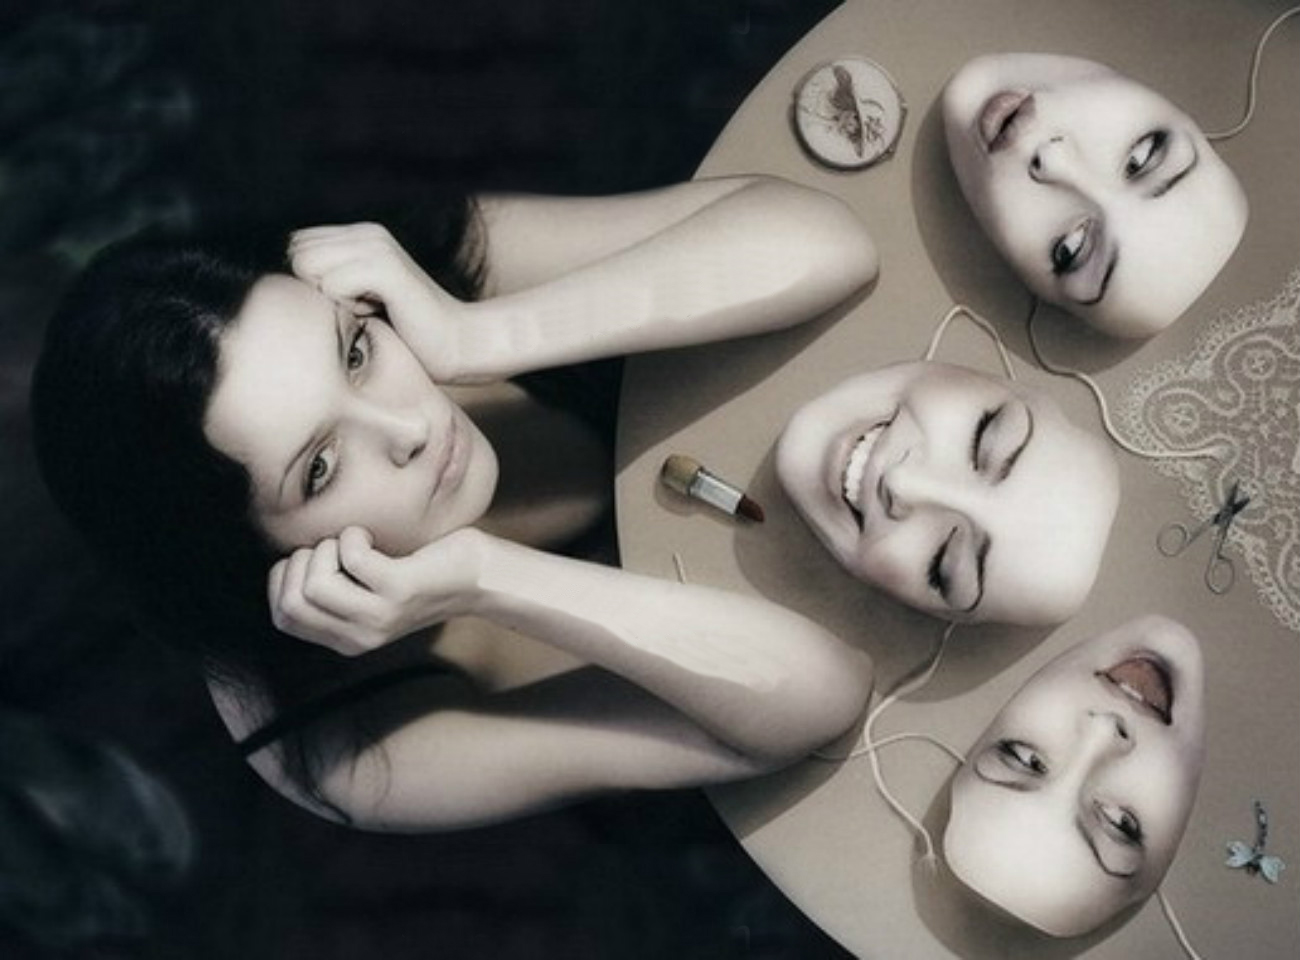 comunicazione fantalica maschere